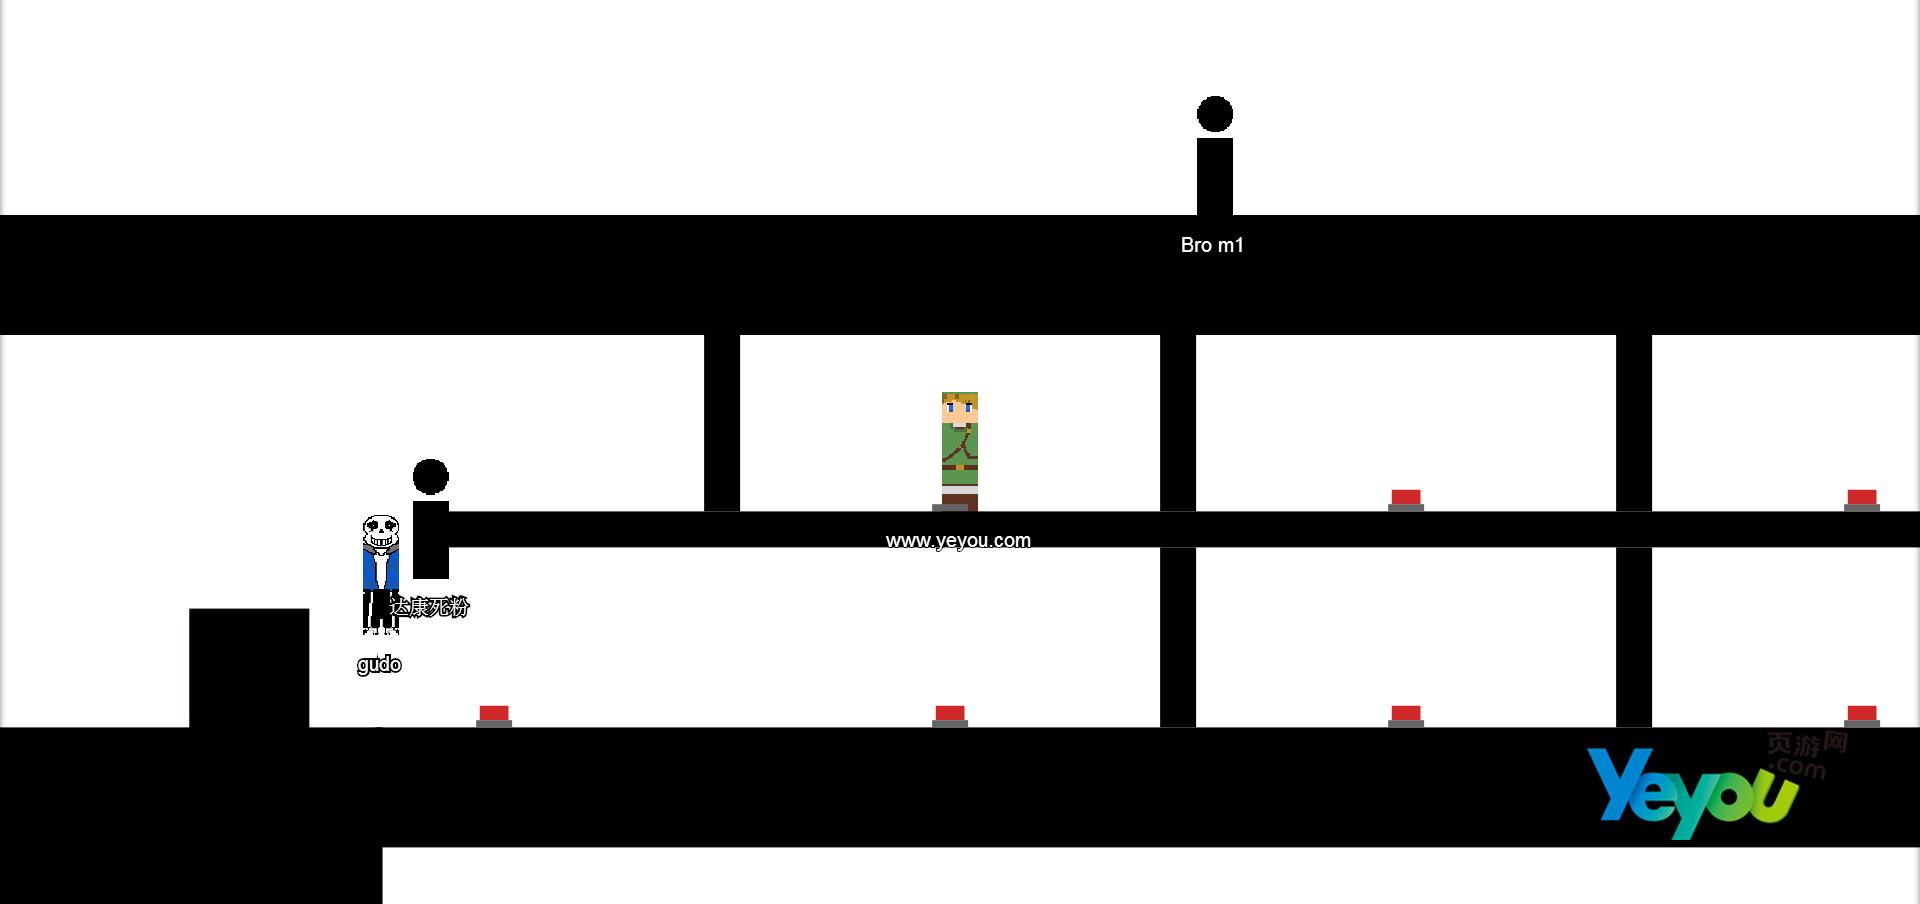 《BROFIST.IO》游戏截图